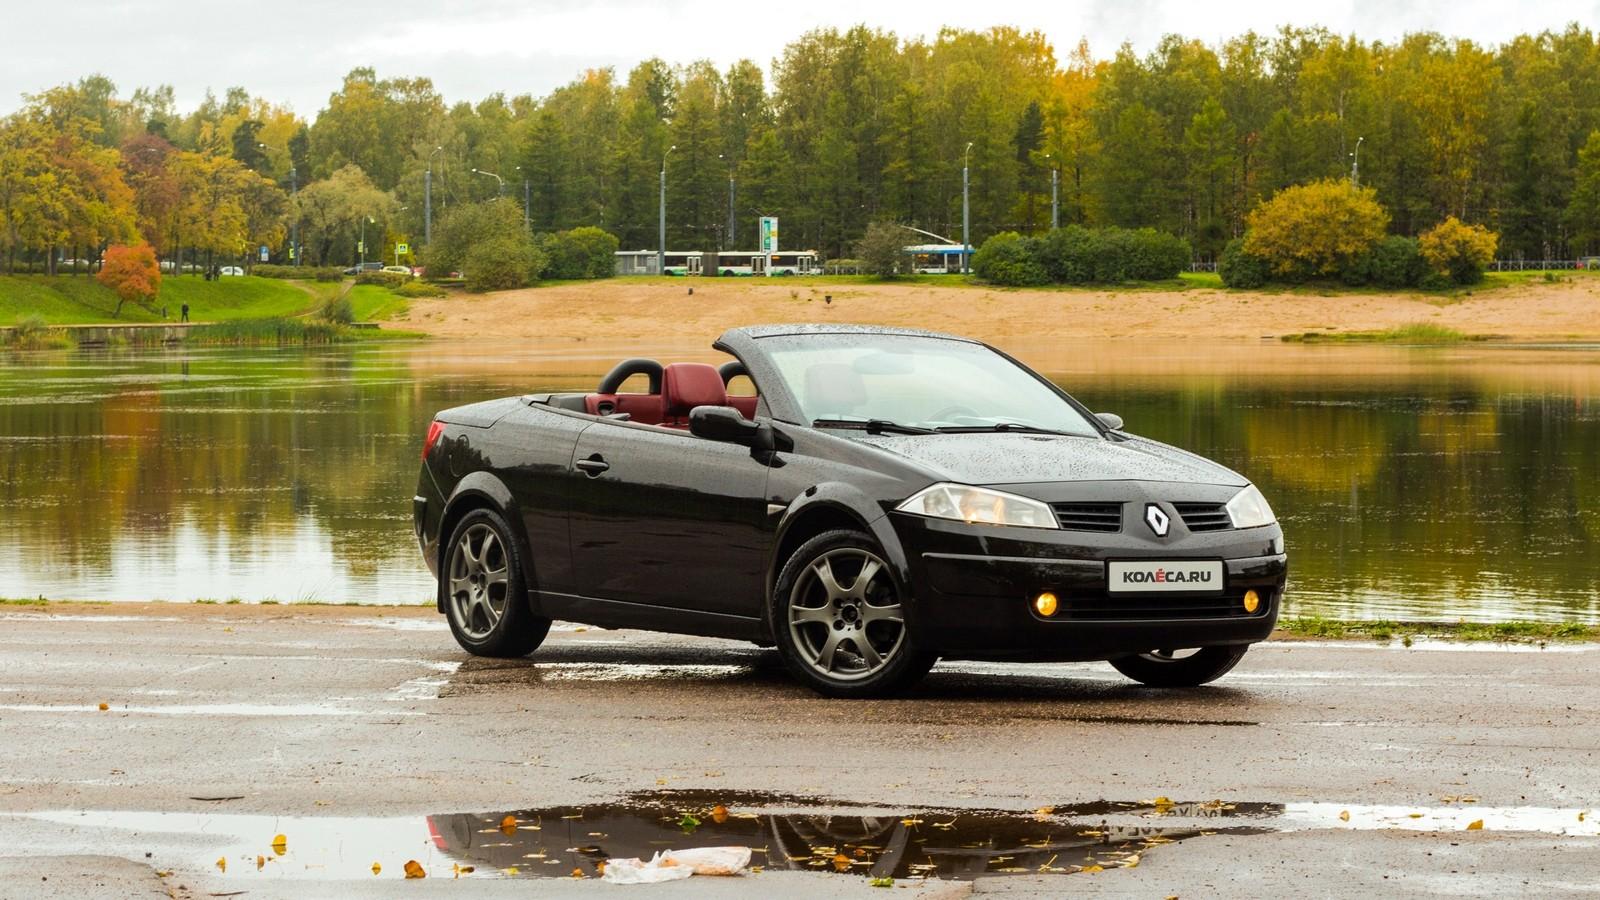 Renault-Megane-кабриолет-три-четверти-(3)